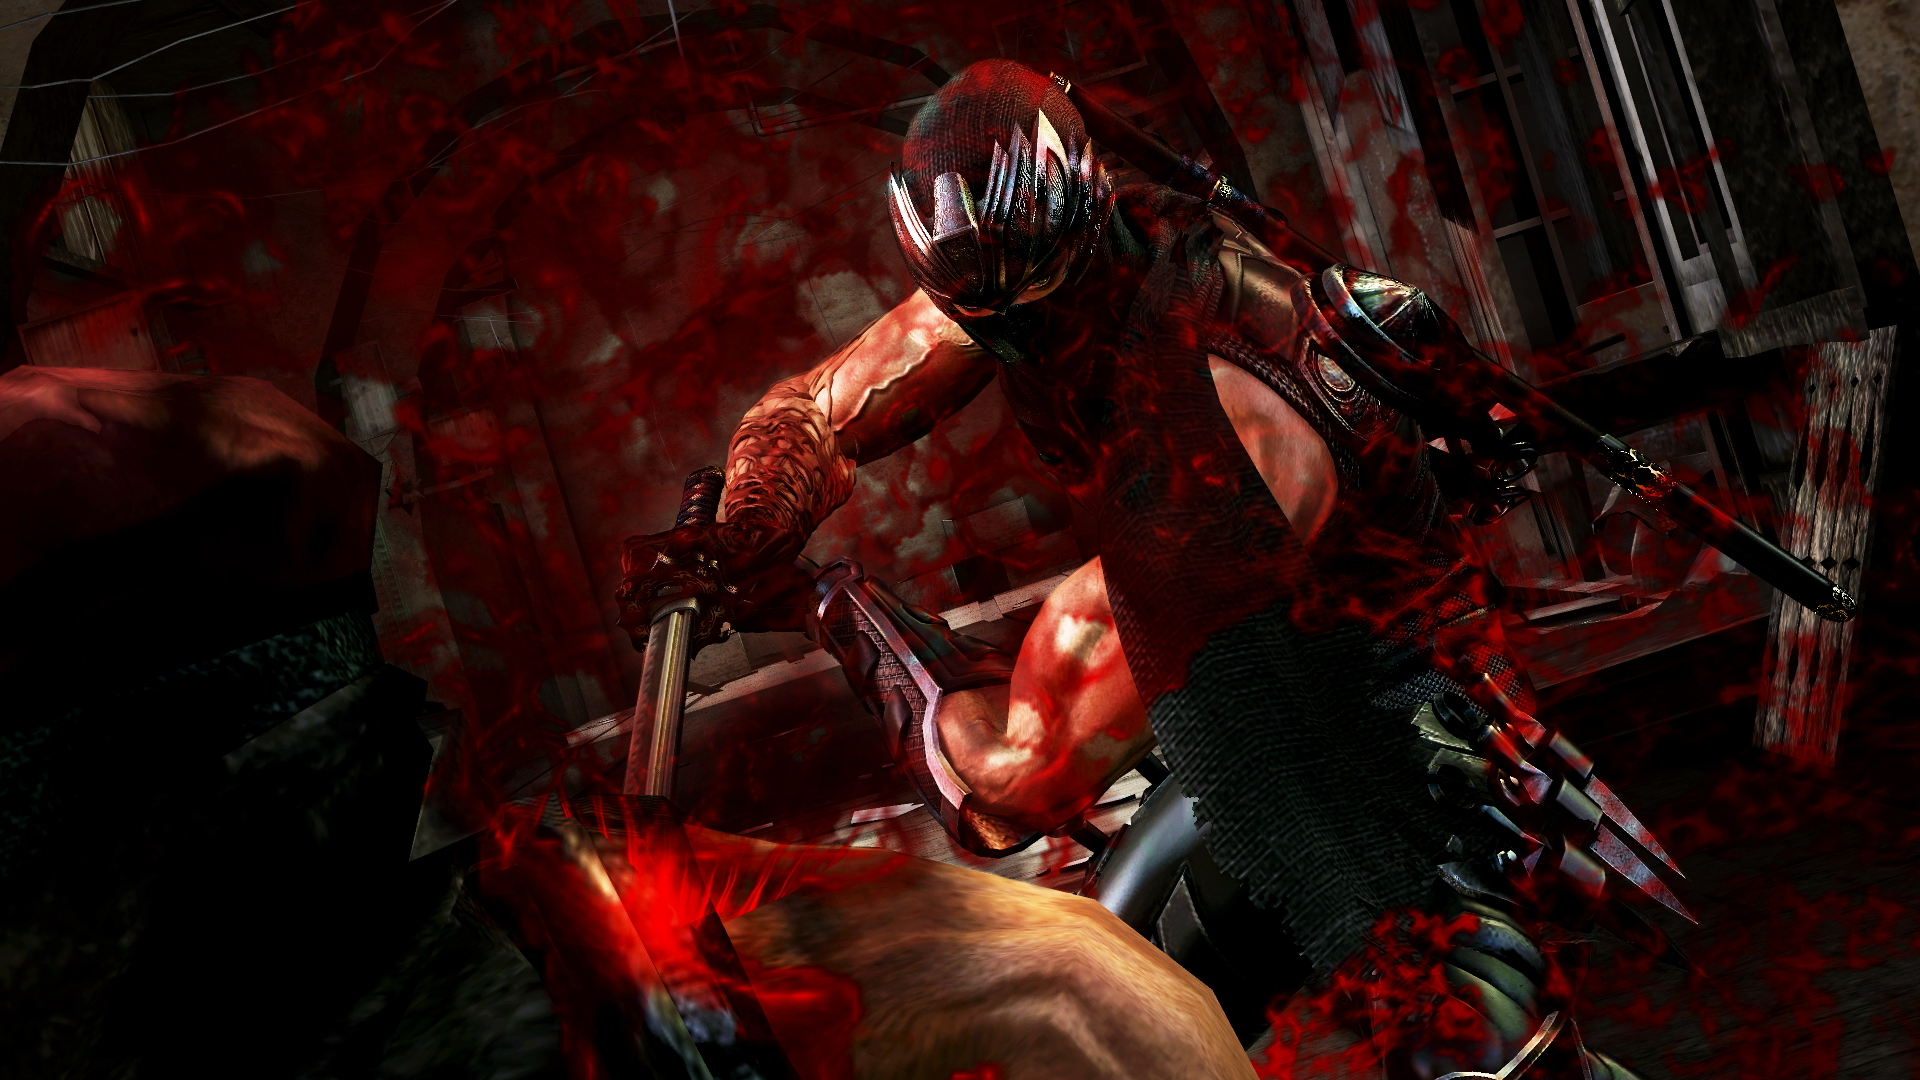 bloody sword wallpaper - photo #37